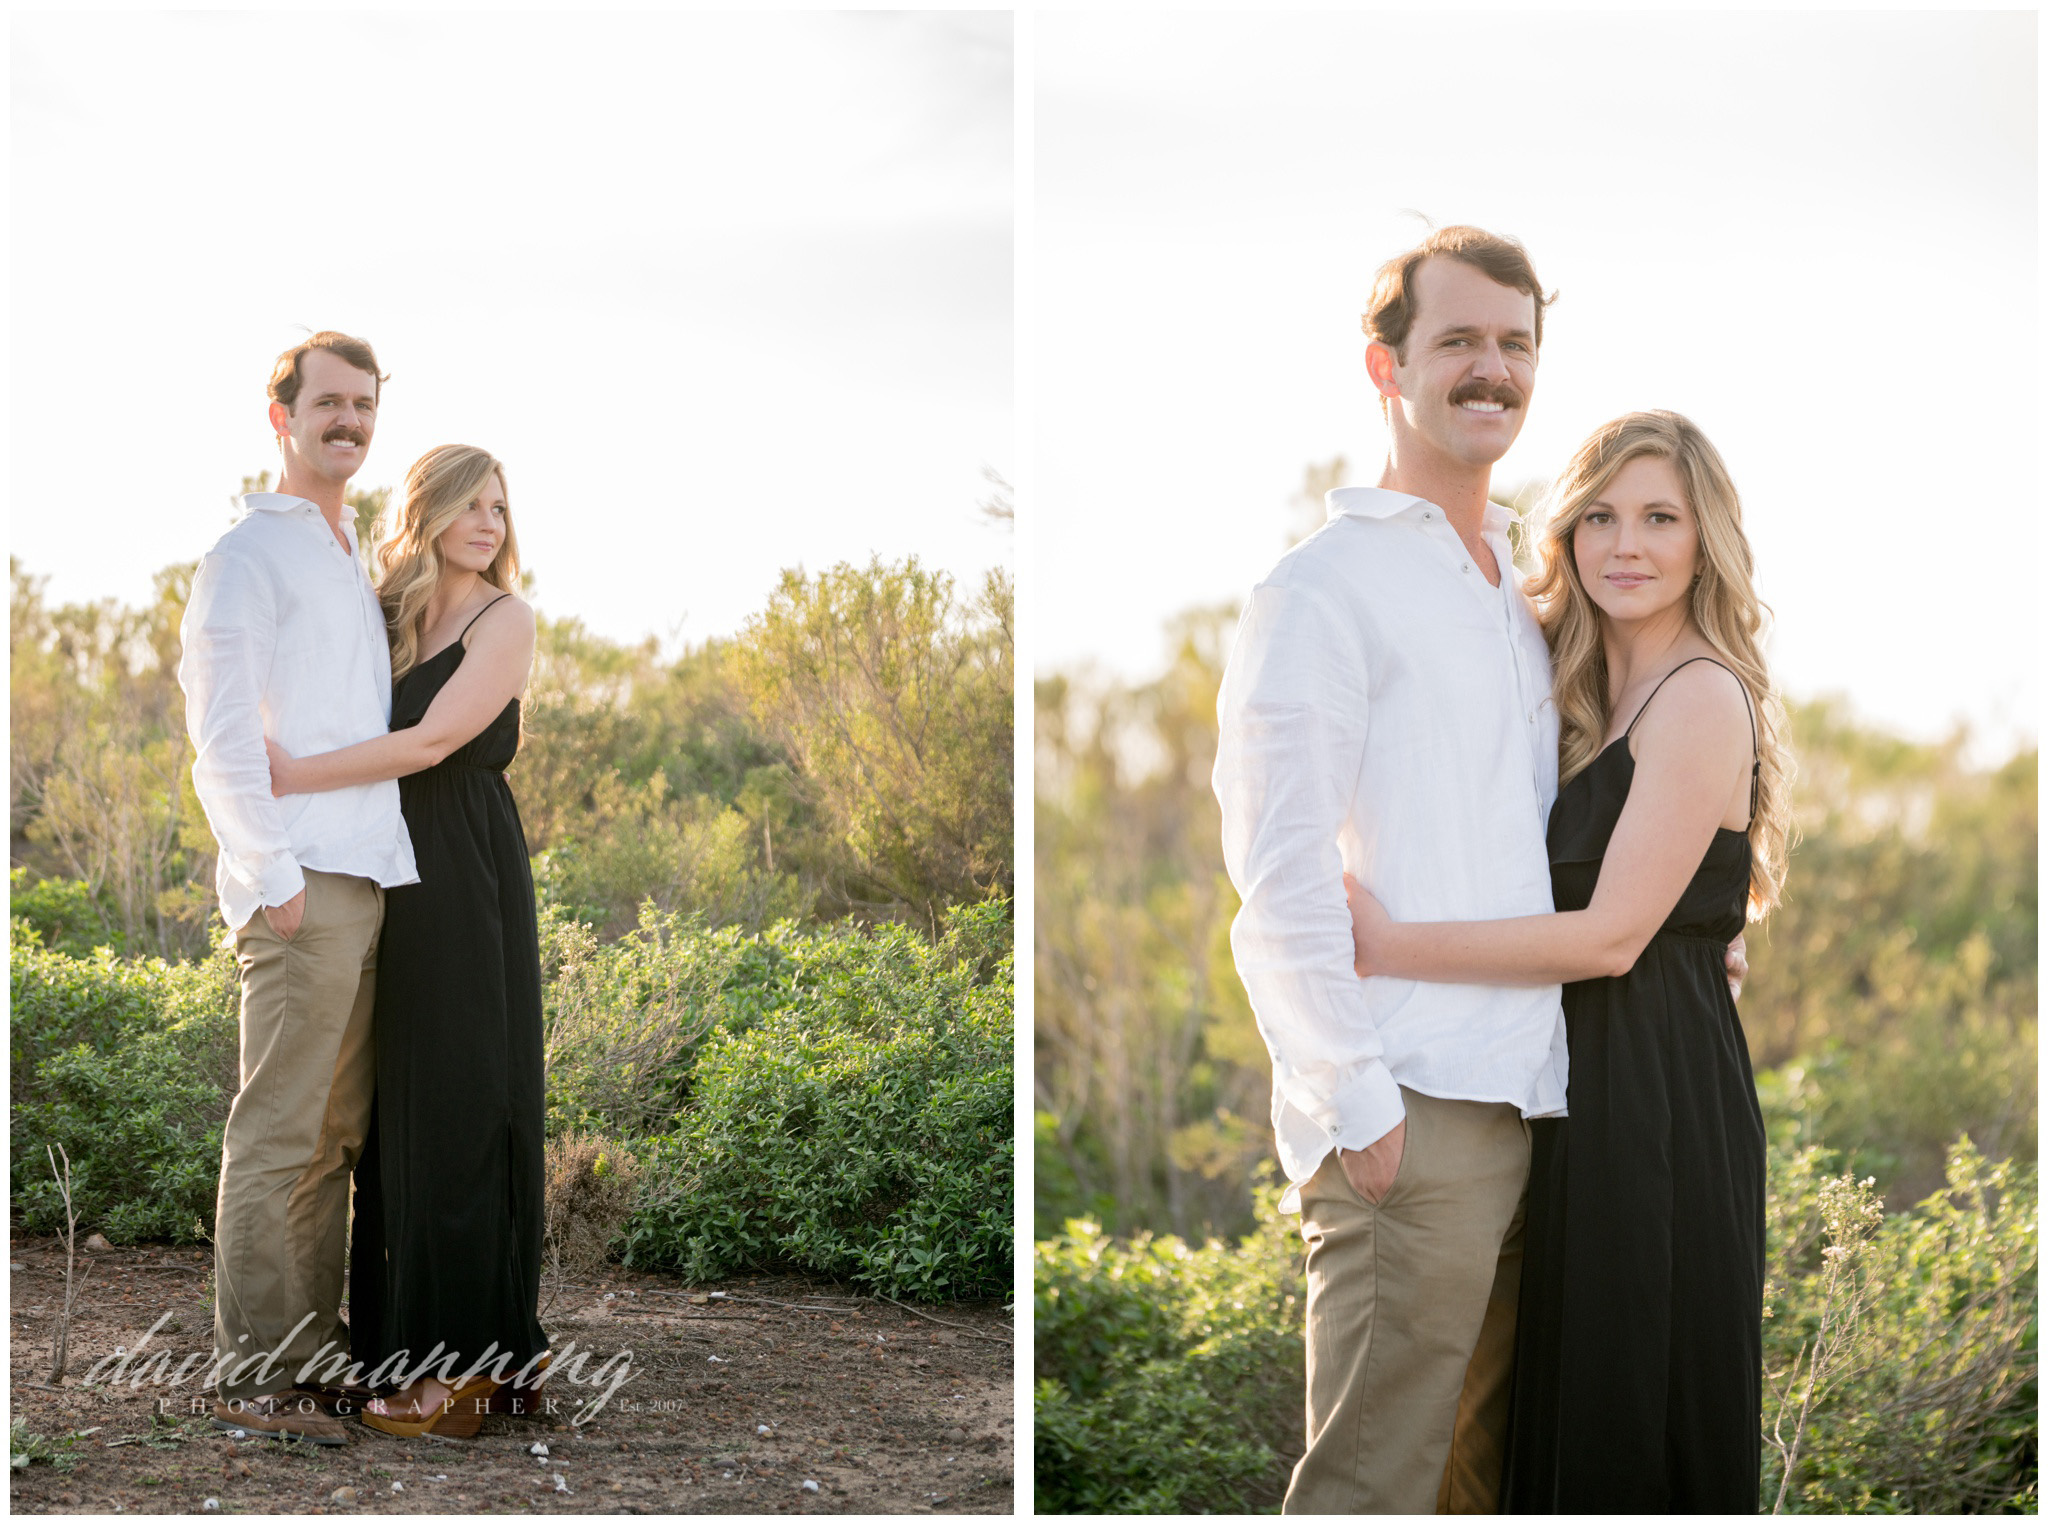 Alyssa-Taylor-Engagement-David-Manning-Photographer-0103.JPG